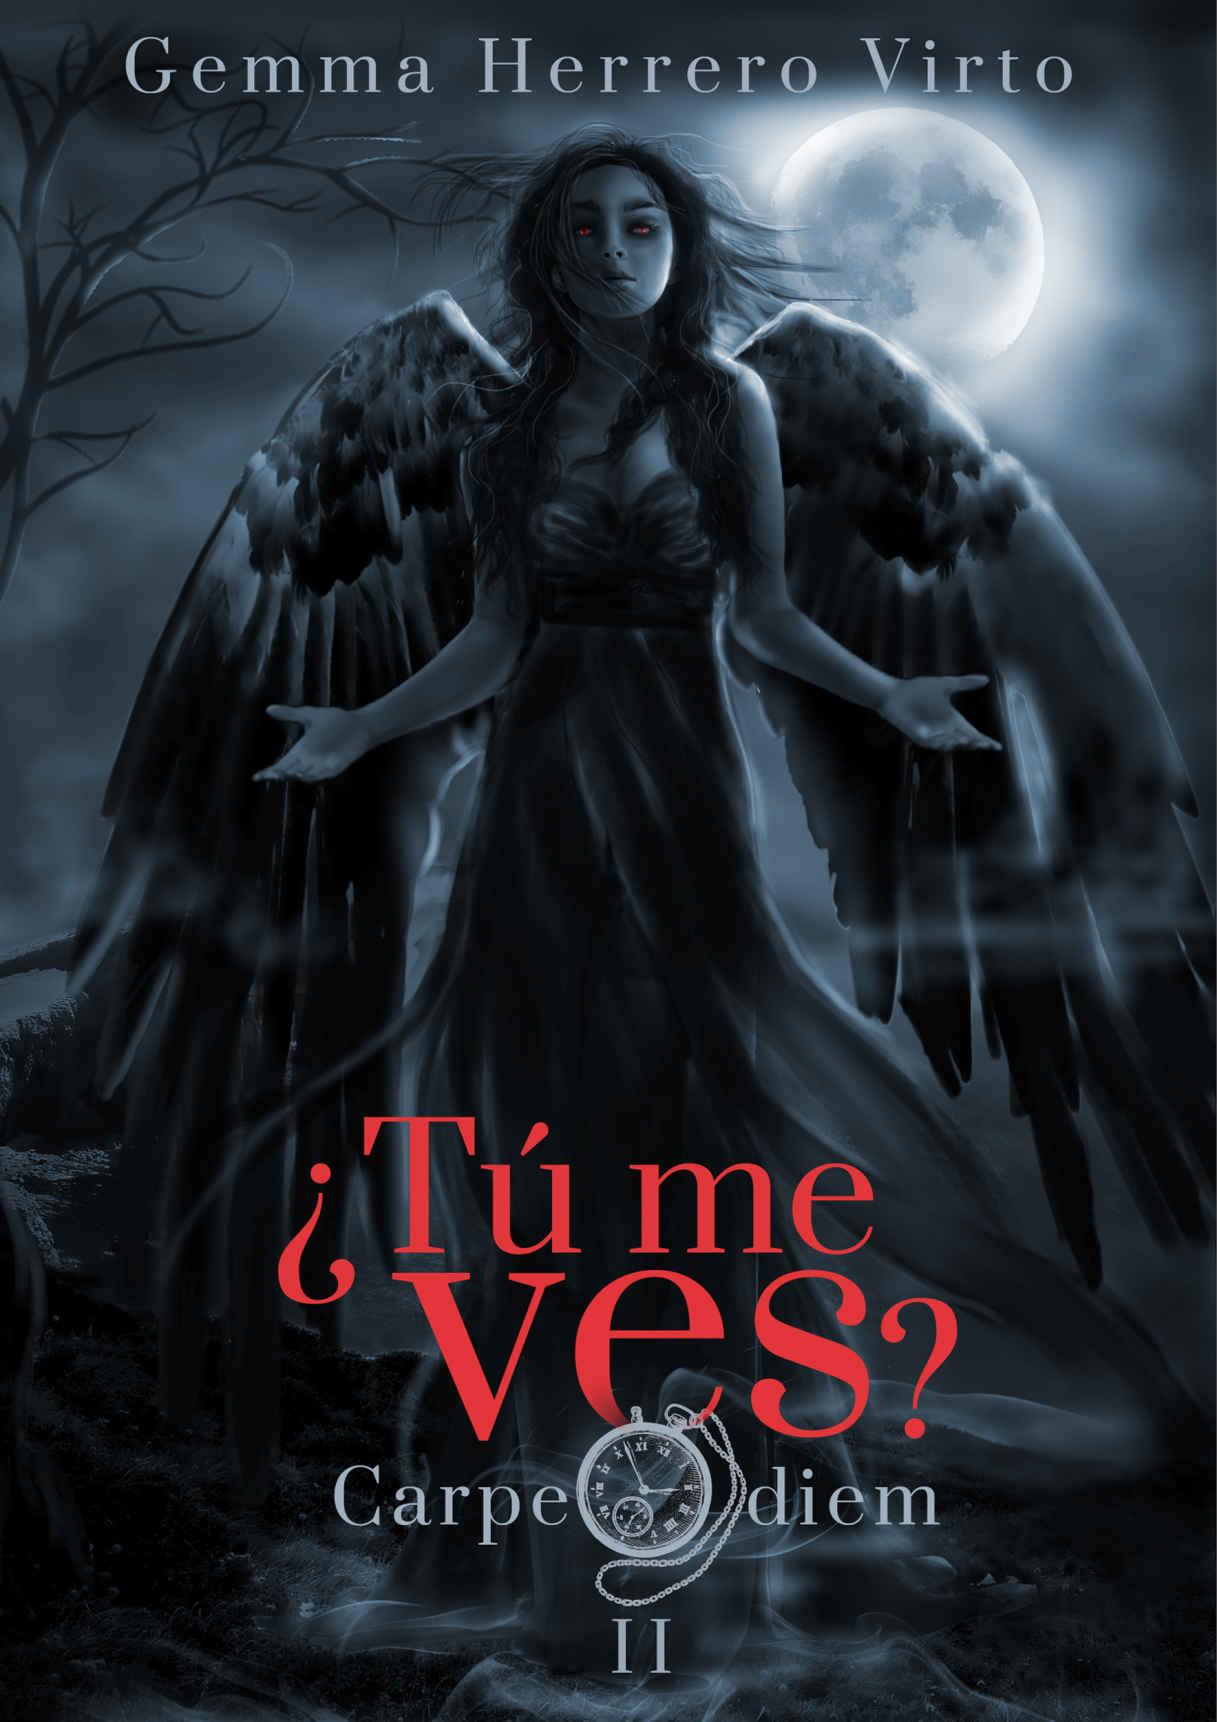 ¿Tú me ves? II: Carpe diem Book Cover